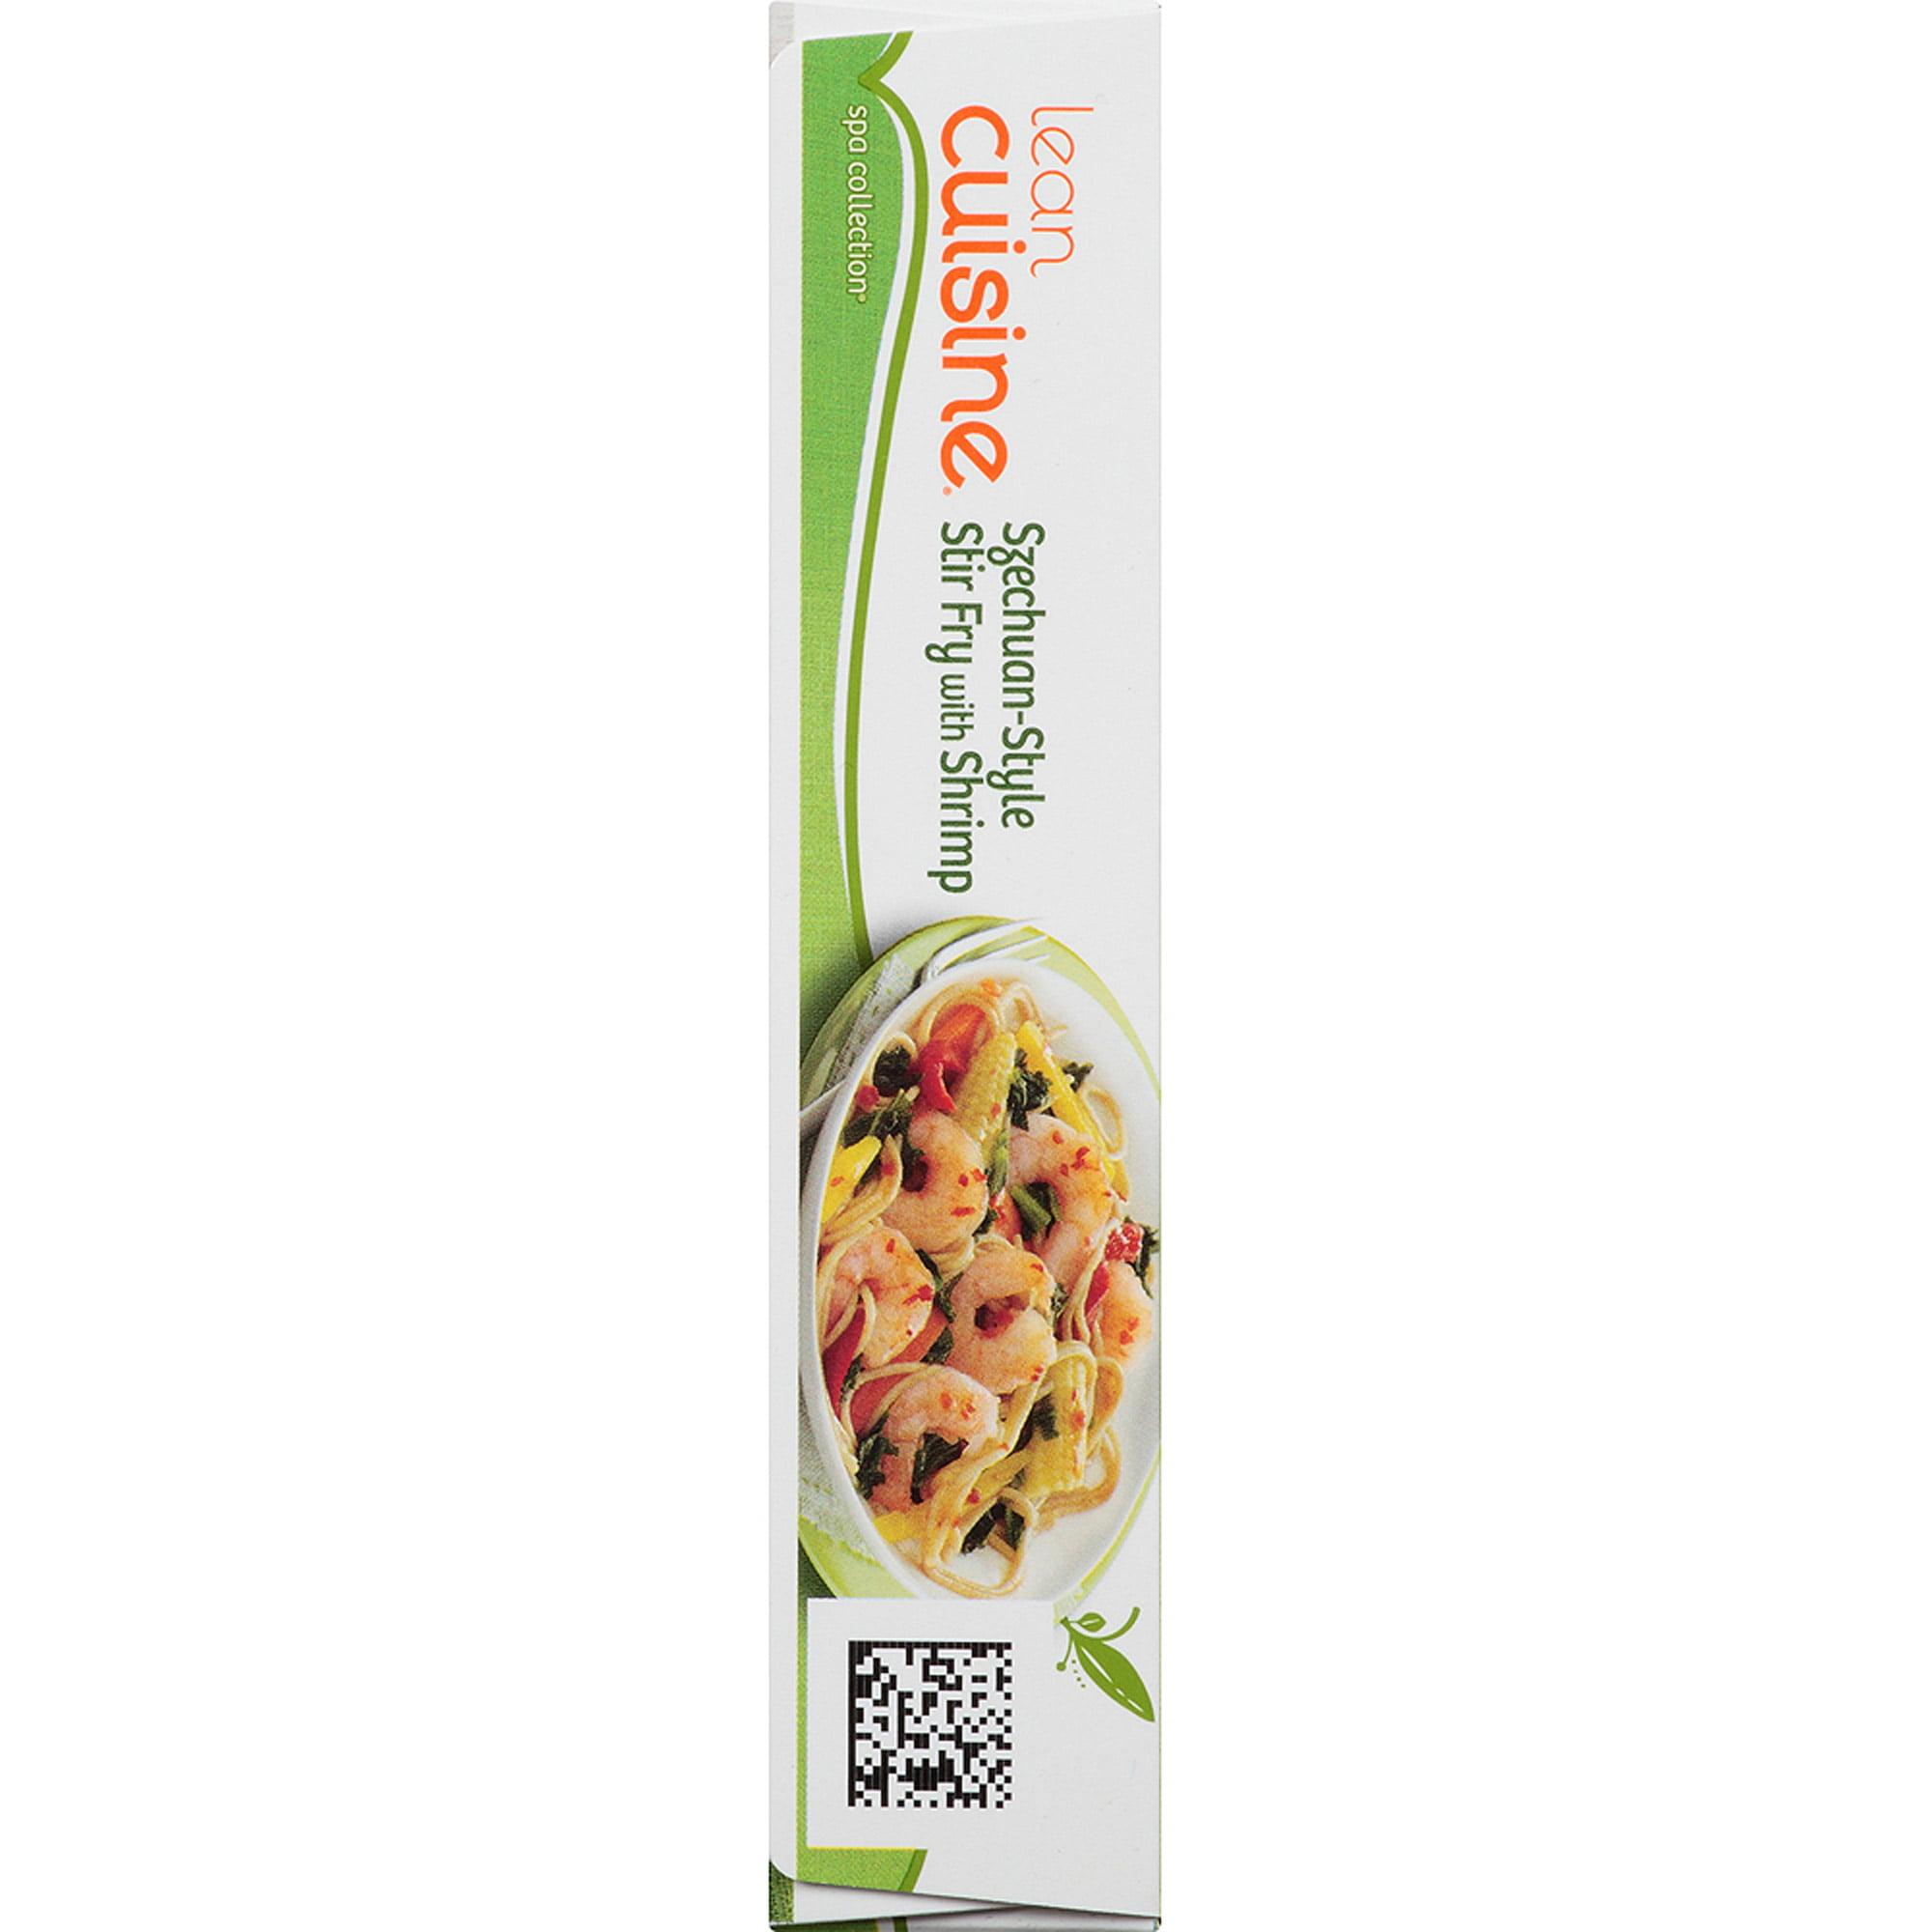 Lean Cuisine Spa Collection Szechuan-Style Stir Fry with Shrimp, 9 ...